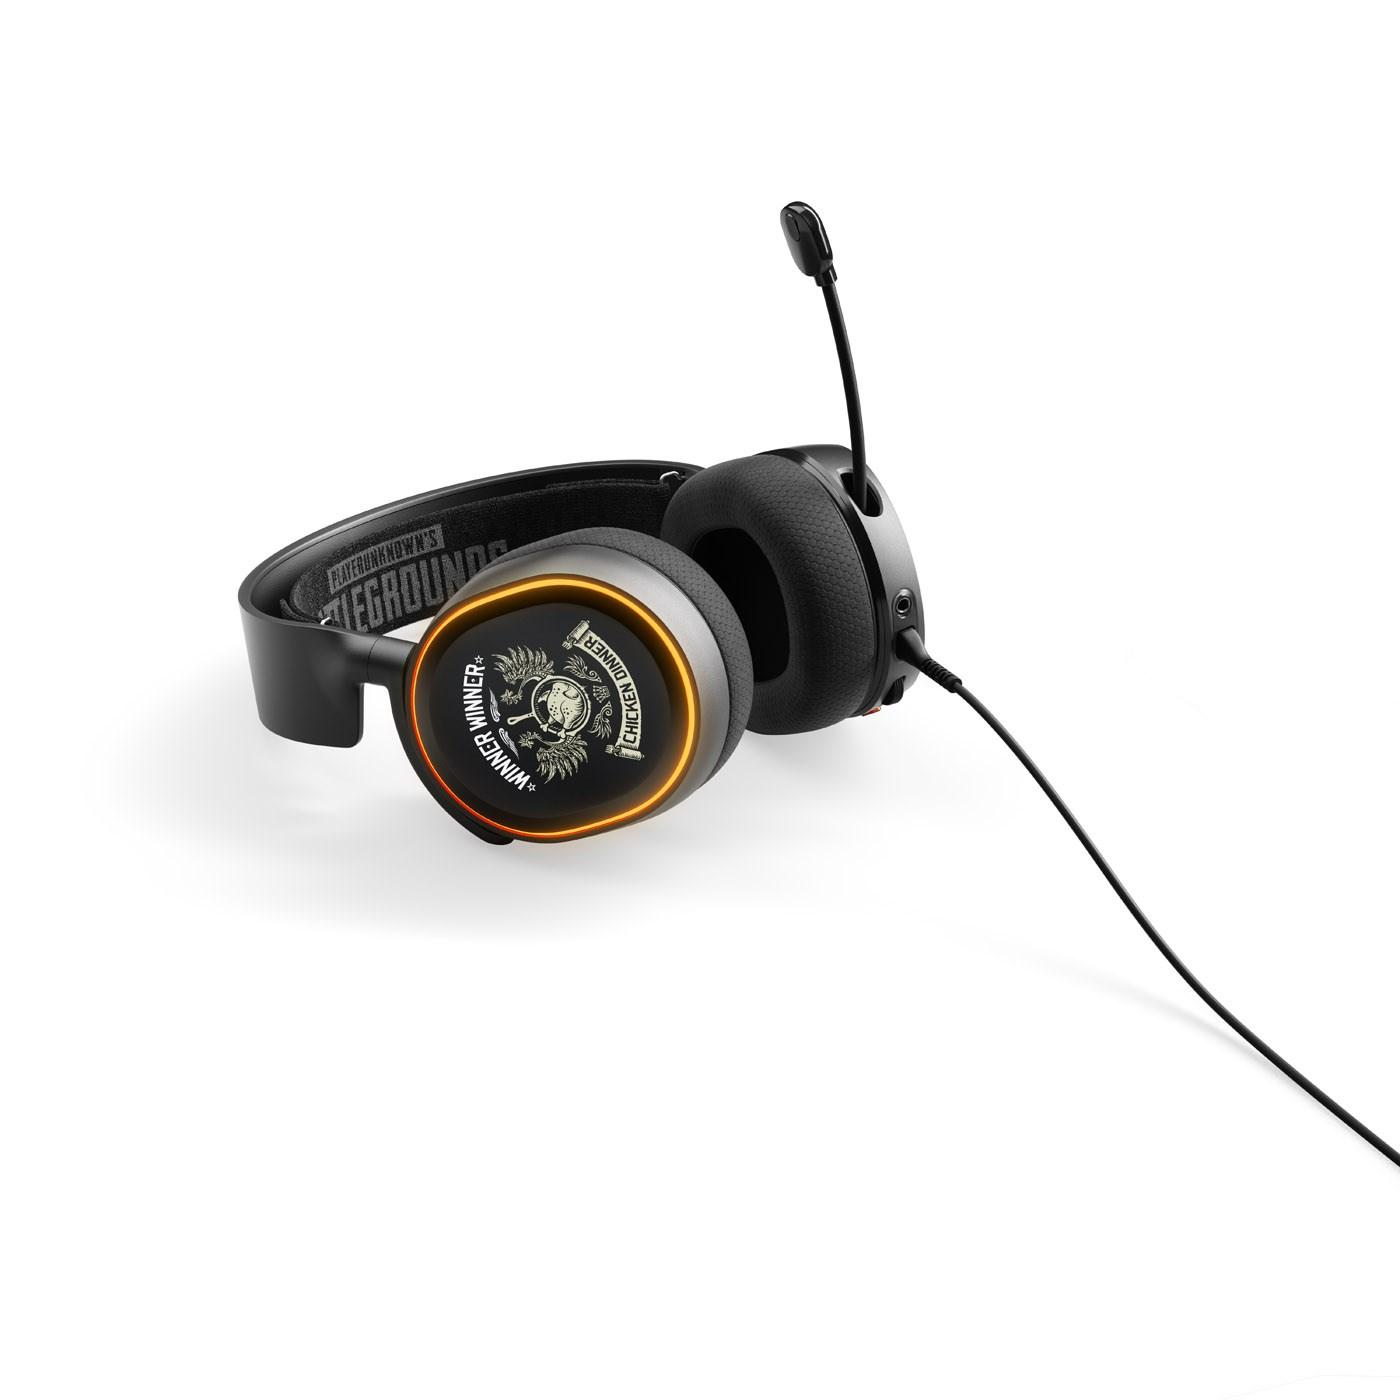 SteelSeries Arctis 5 RGB Gaming Headset Bi-Directional (PUBG Edition)